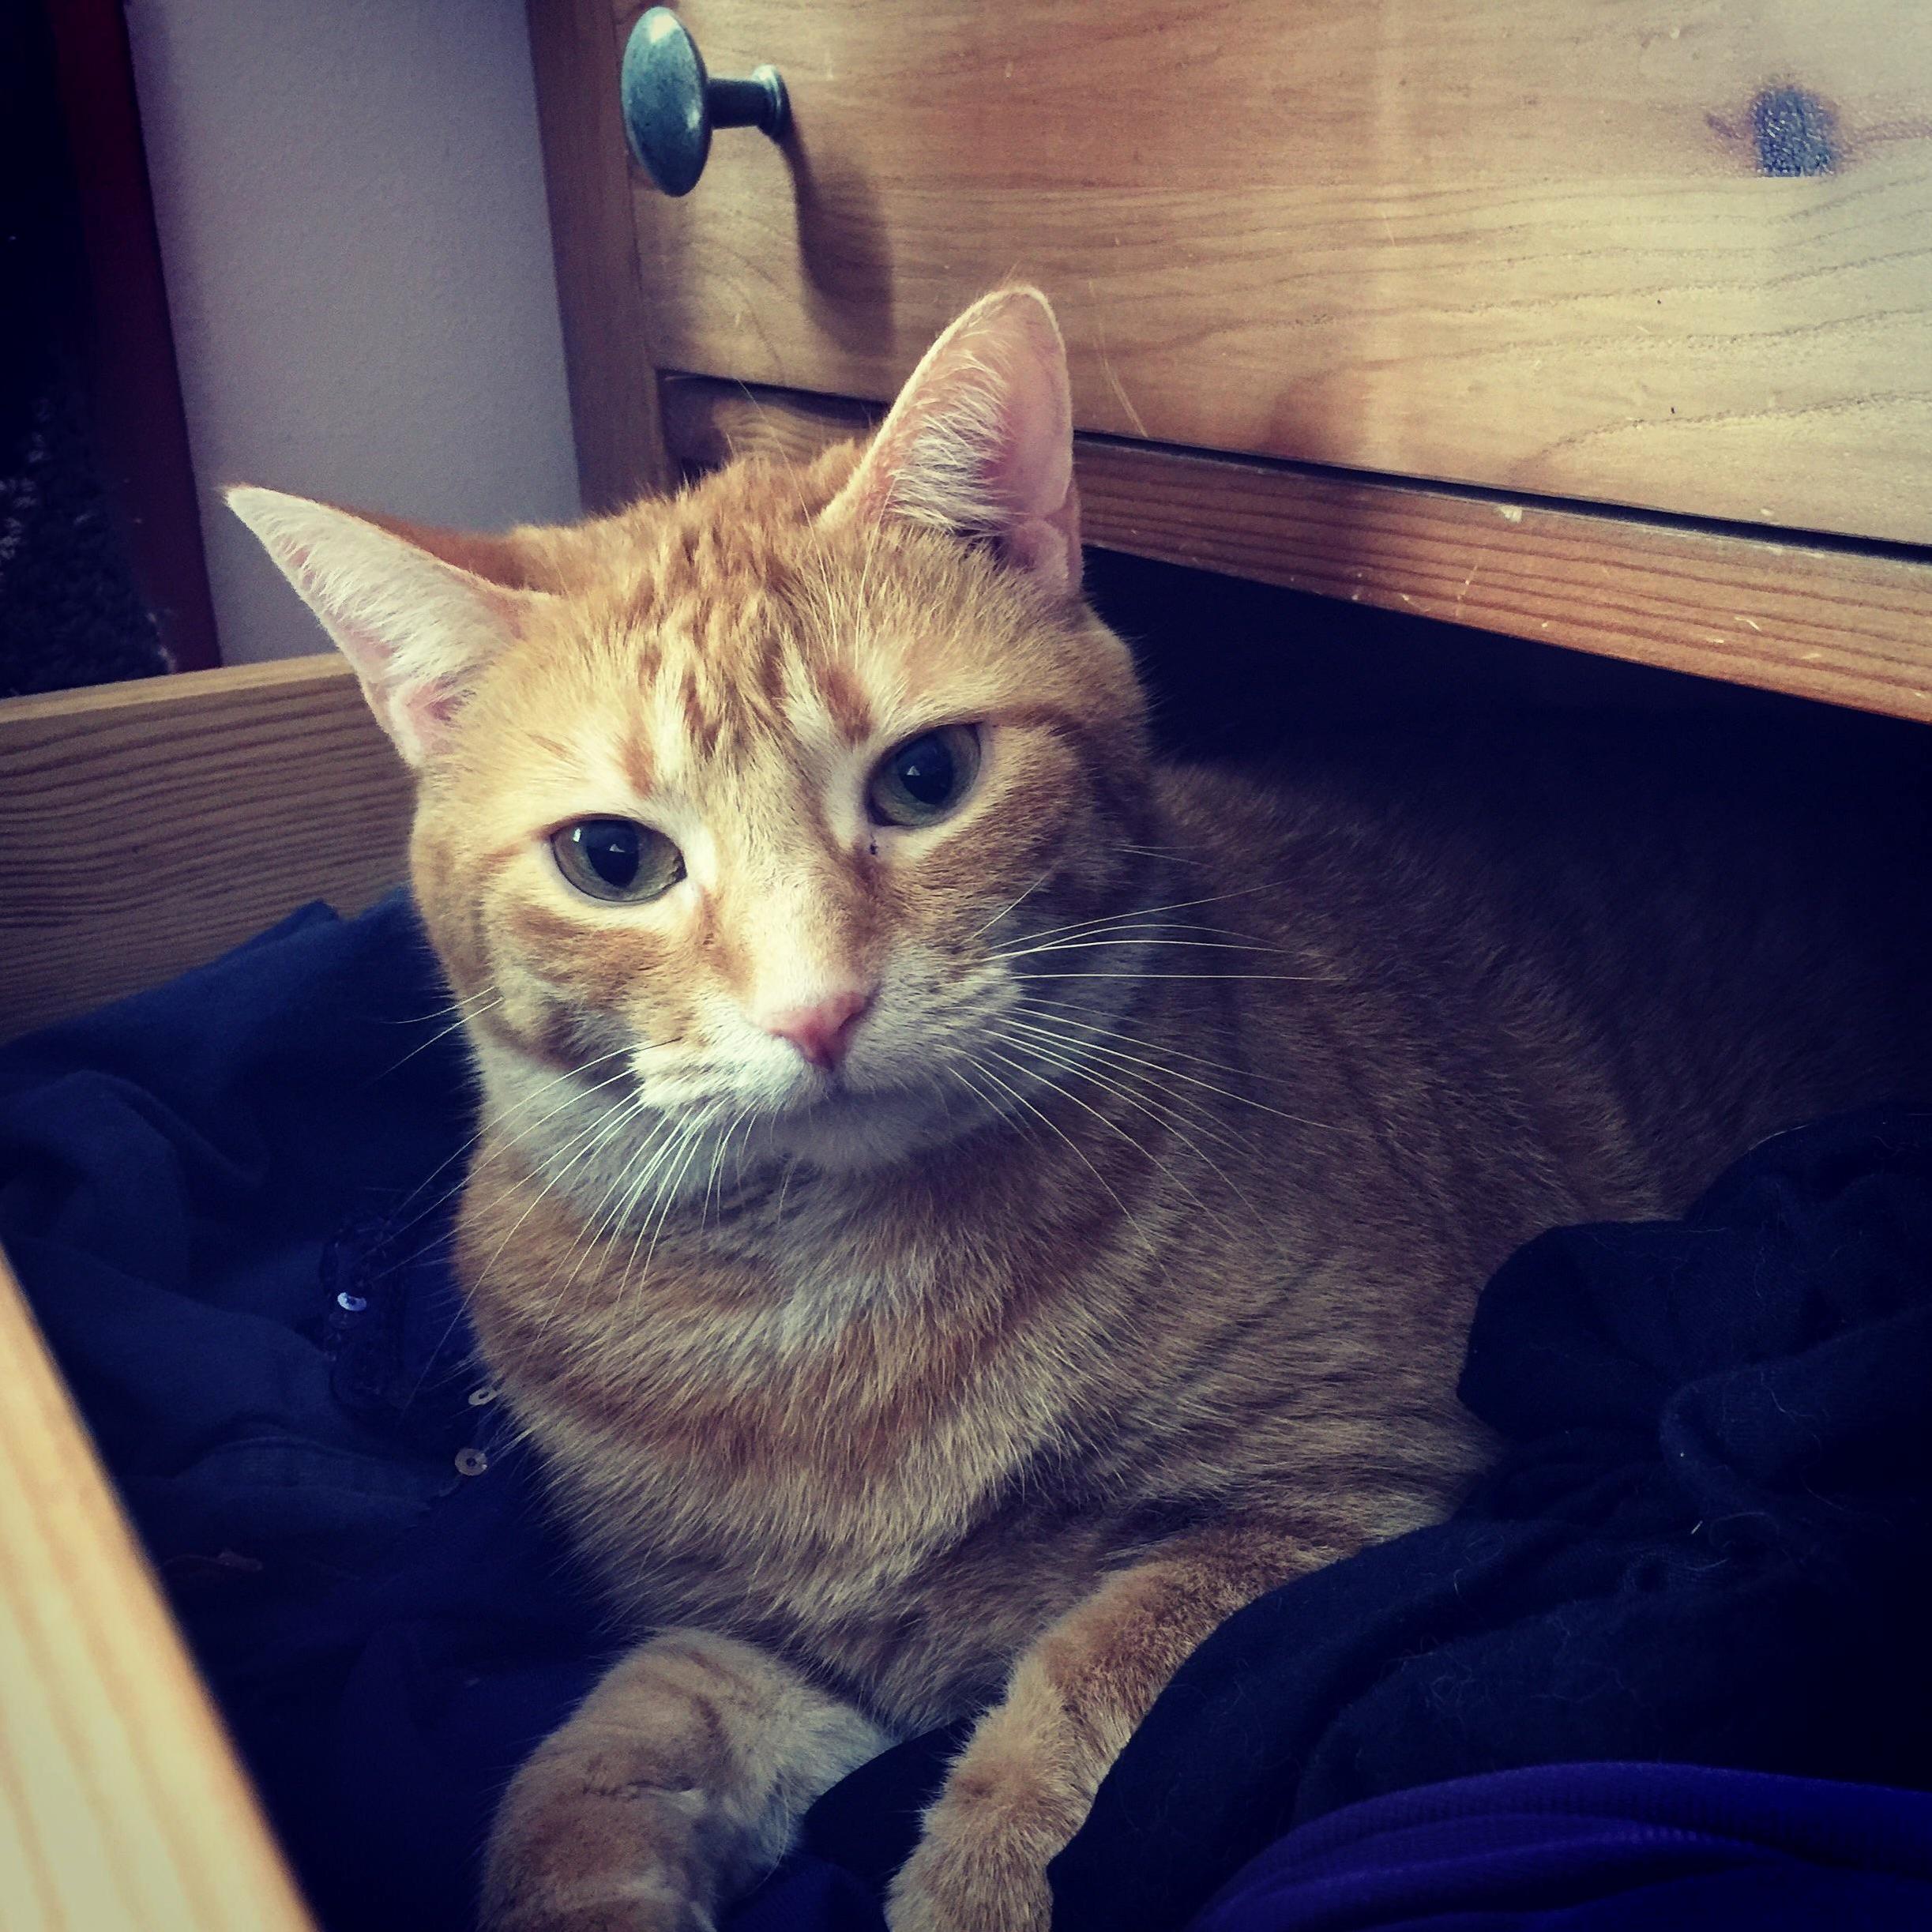 My laundry assistant moomoo.